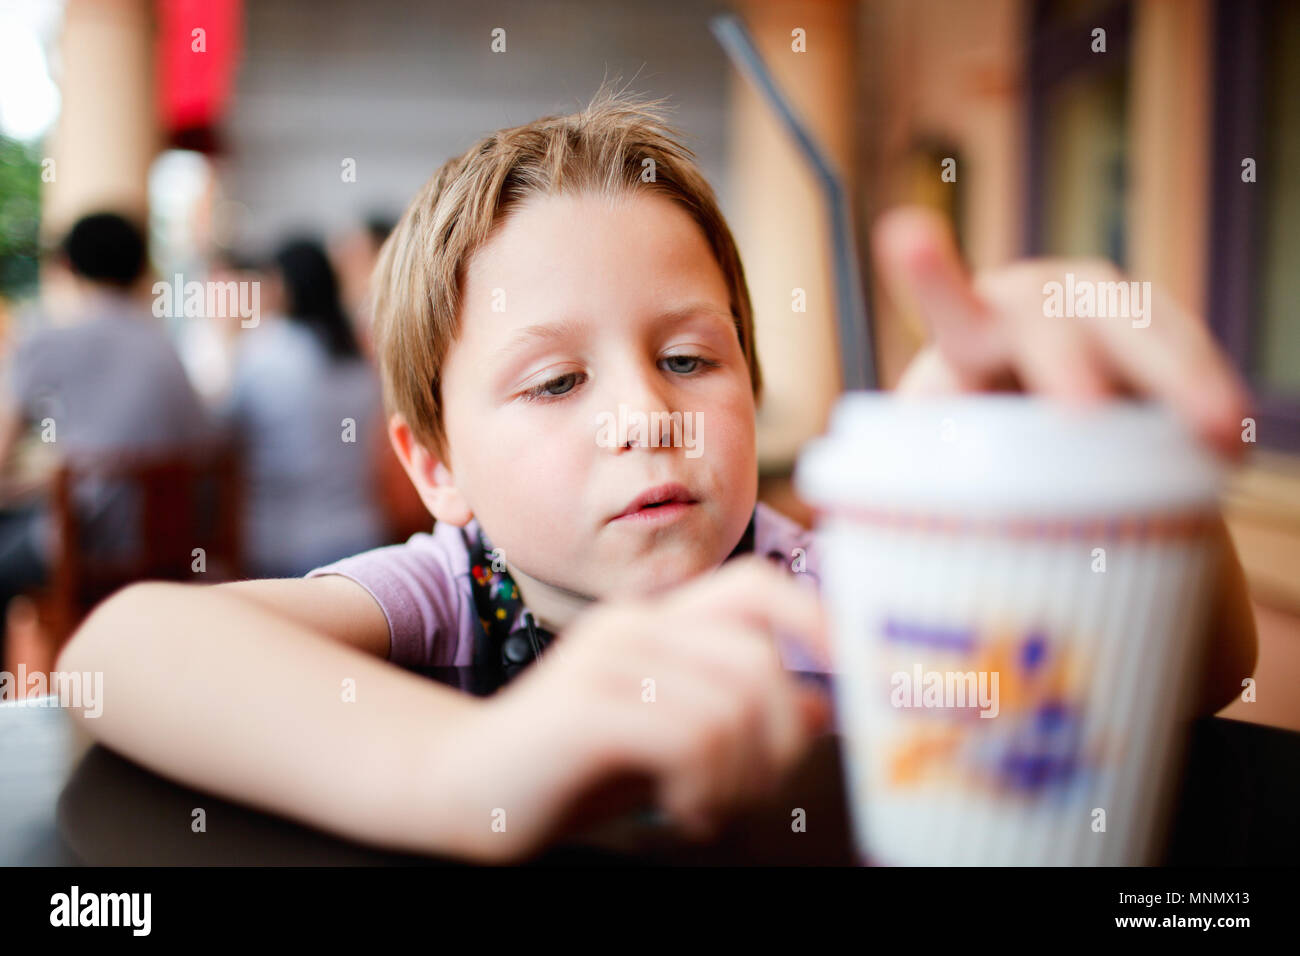 Retrato casual de niñito en cafe Imagen De Stock